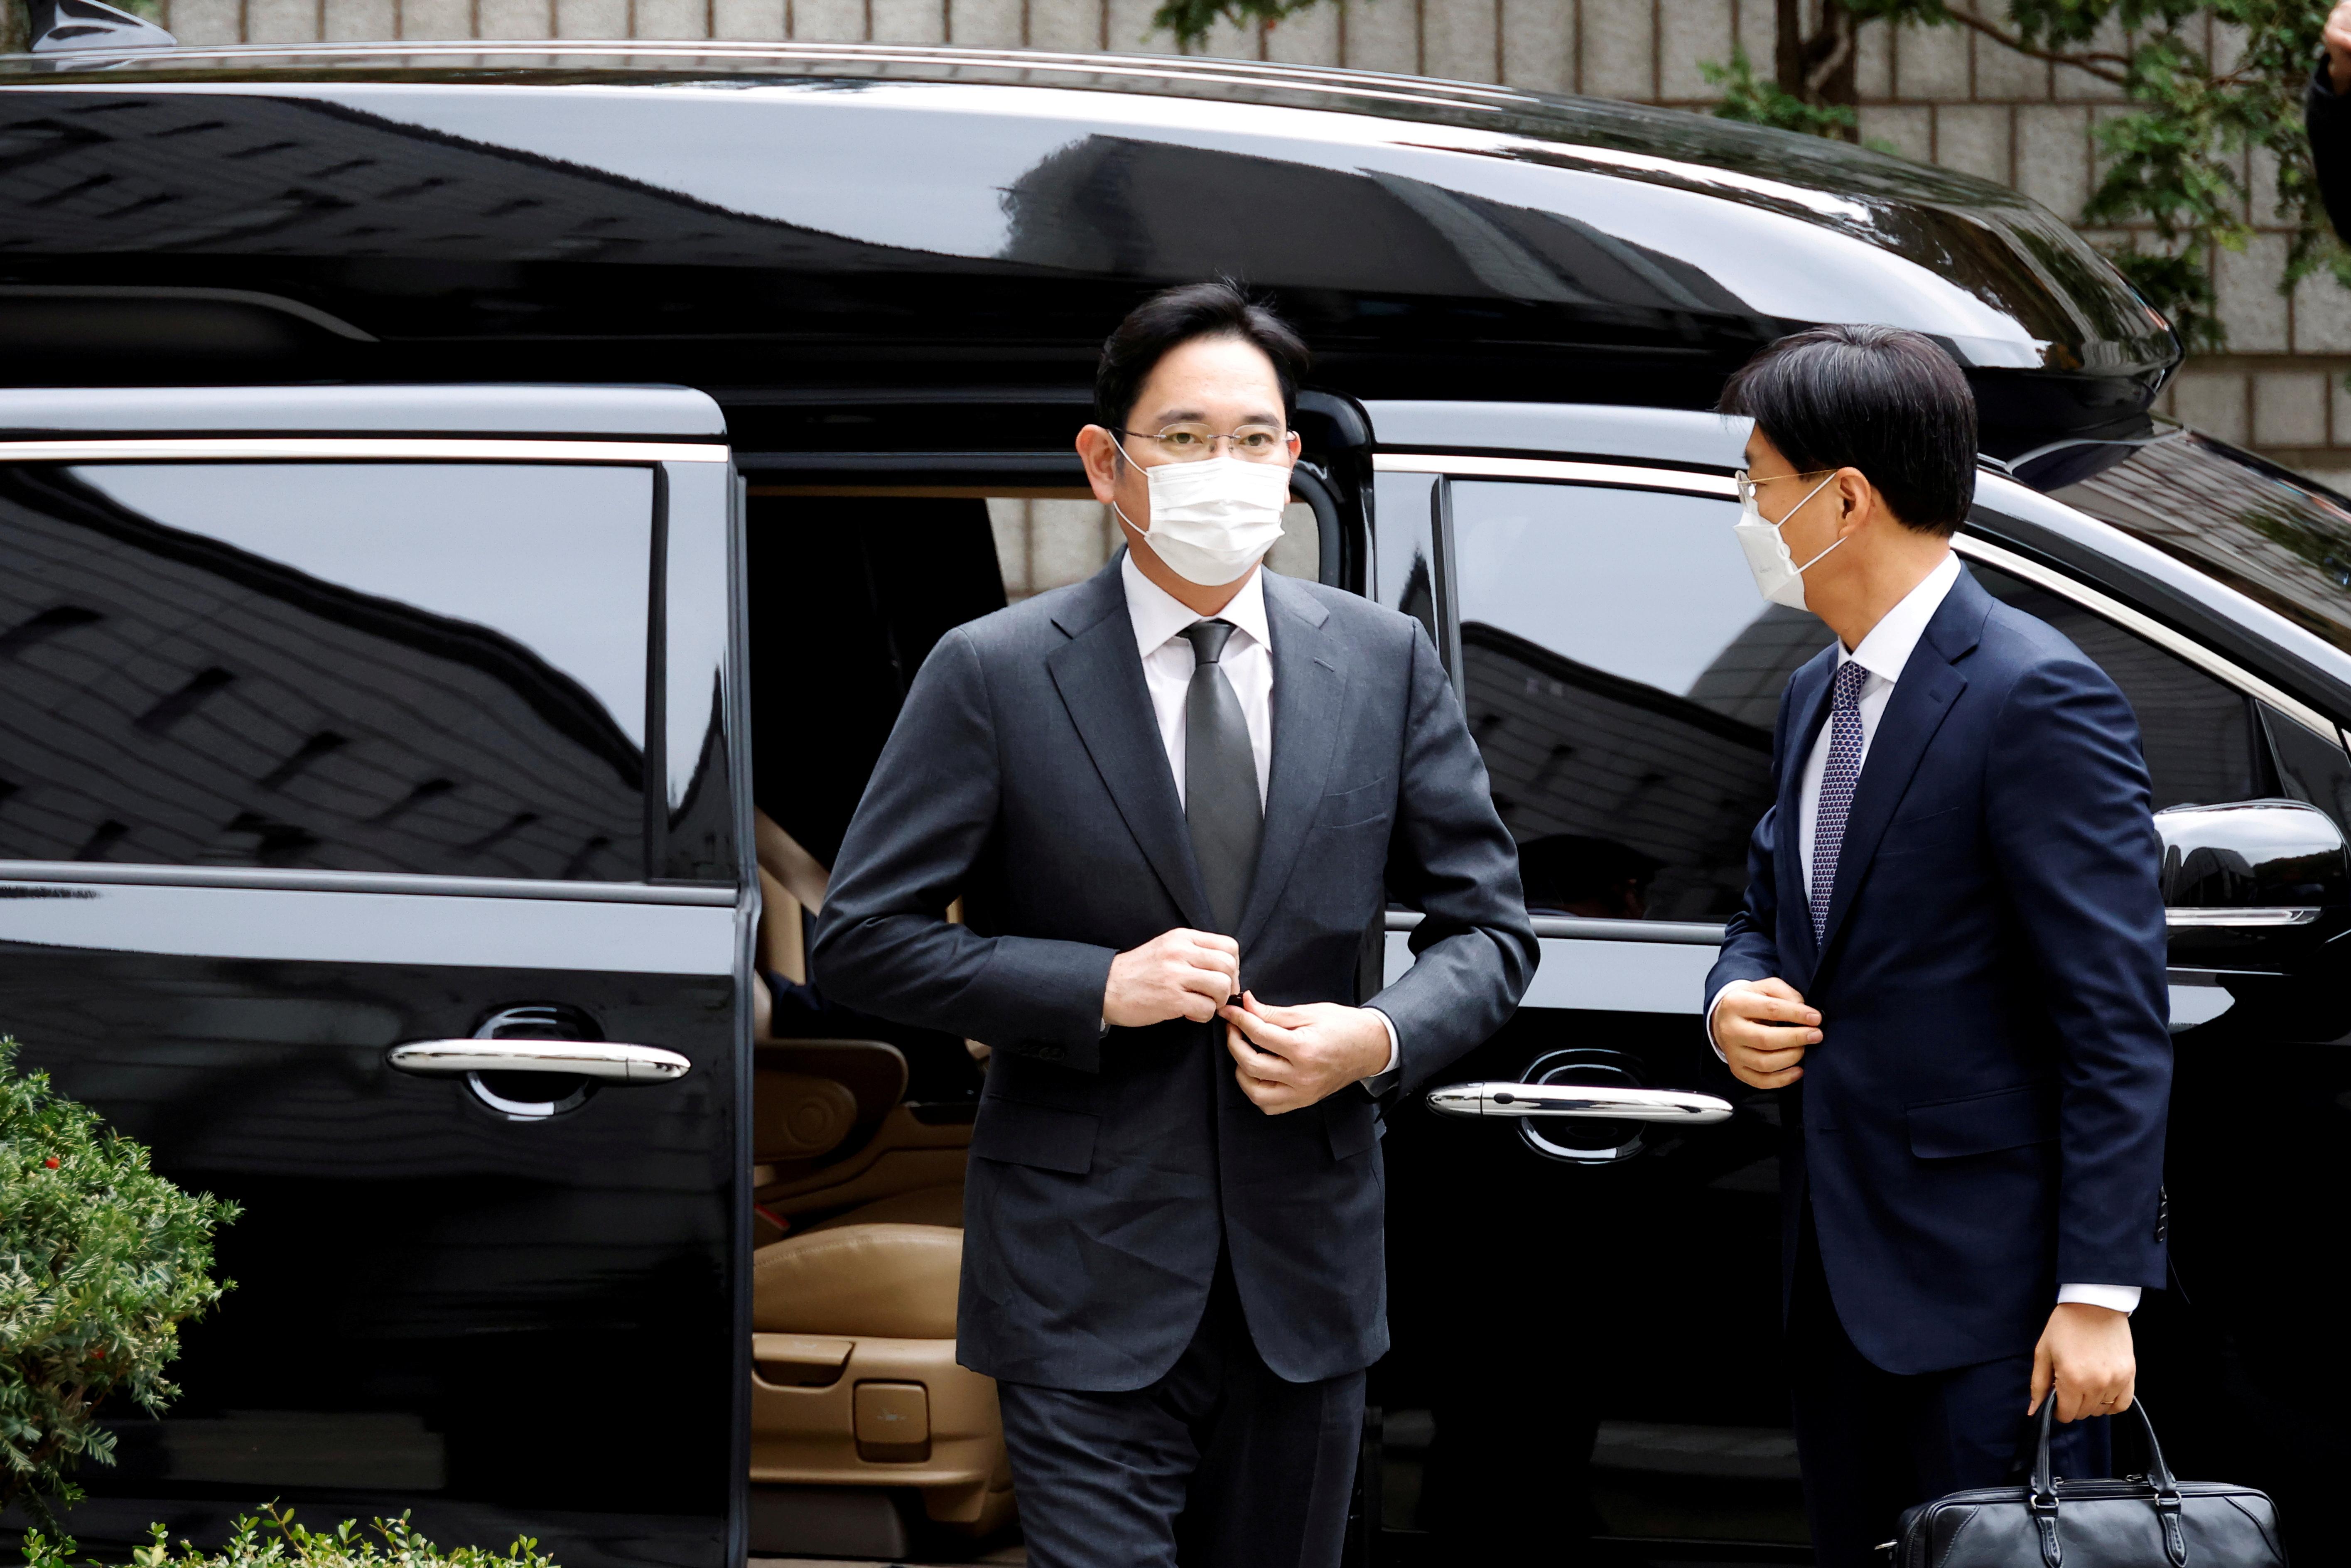 Samsung Group heir Jay Y. Lee arrives at a court in Seoul, South Korea, November 9, 2020.   REUTERS/Kim Hong-Ji